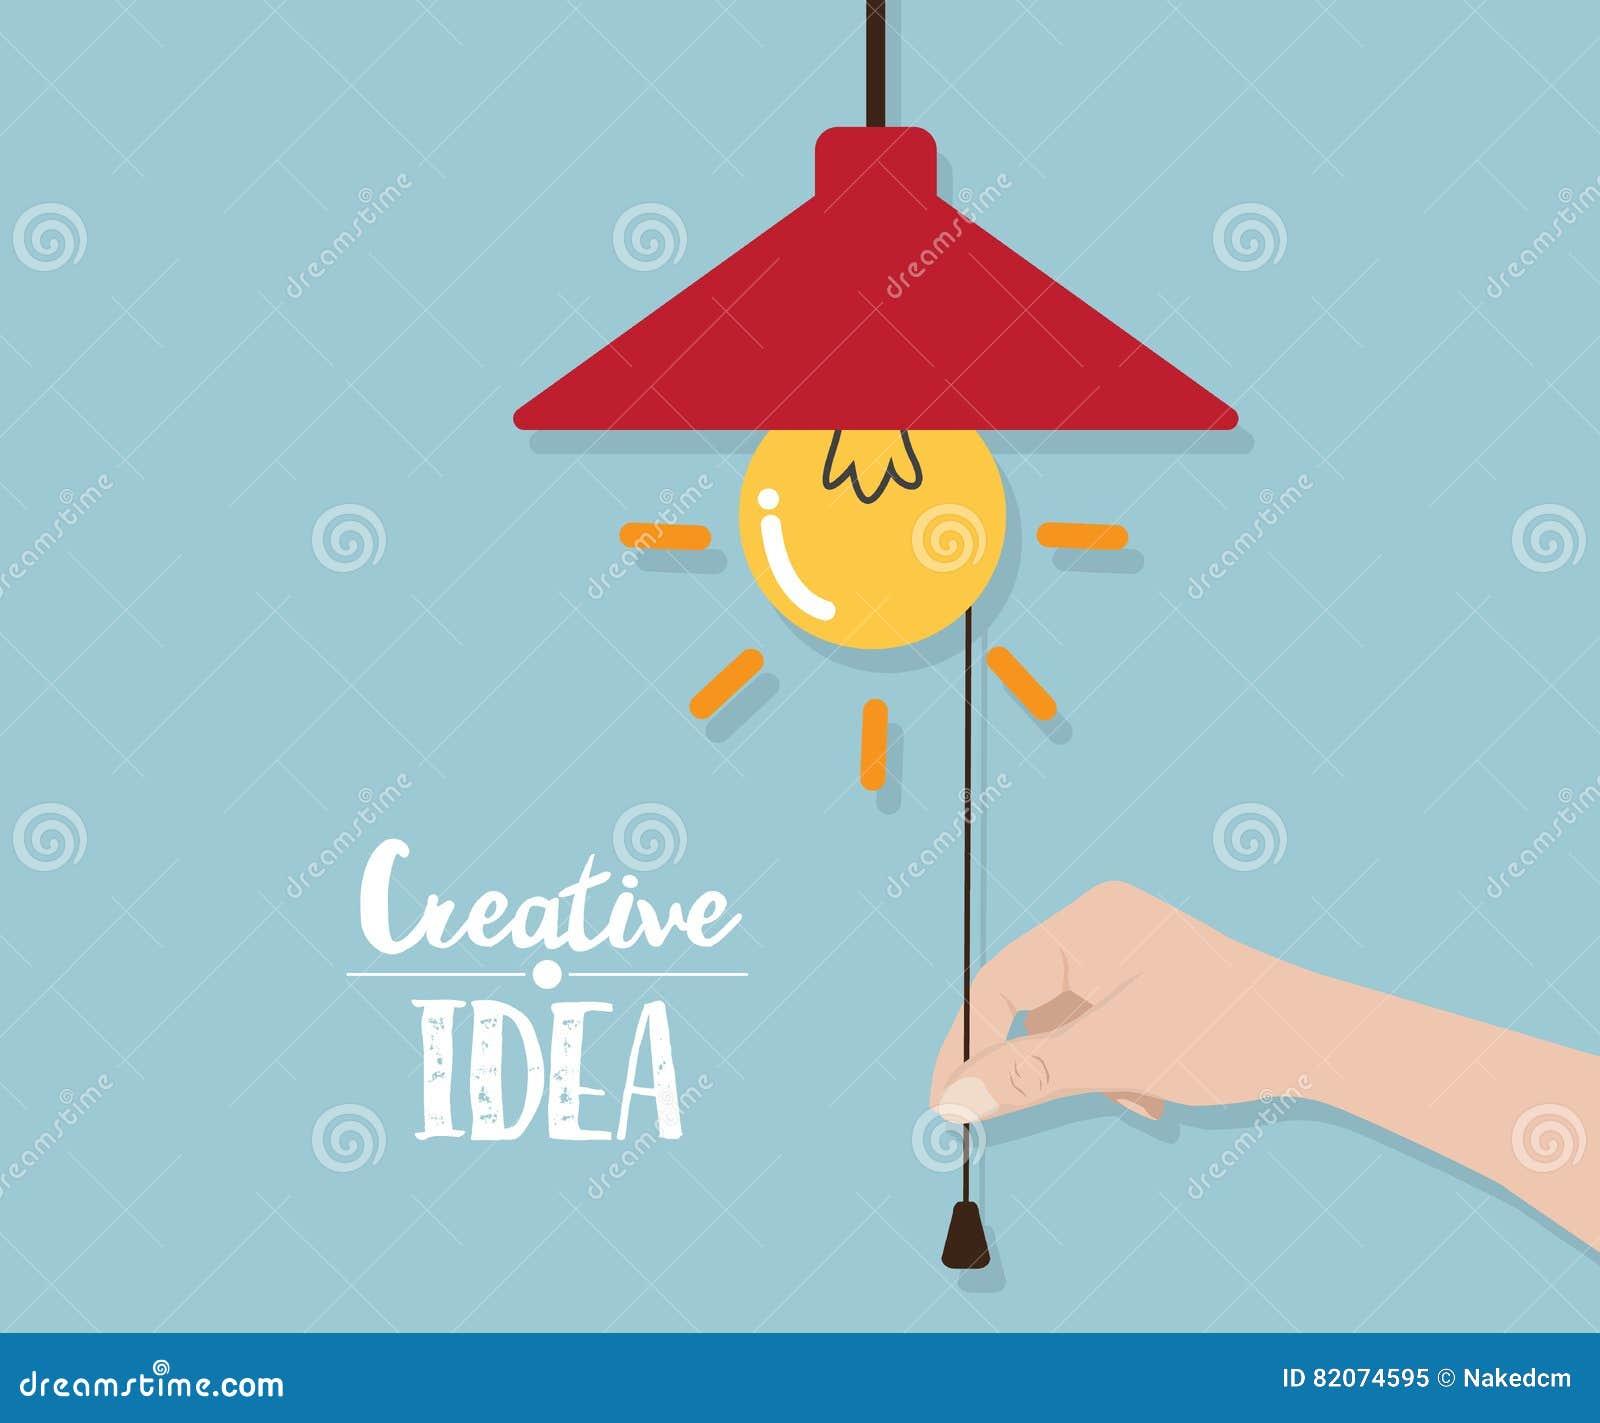 30 Creative Open Concept: Hand Pull Robe For Open Light Bulb Idea Cartoon Vector